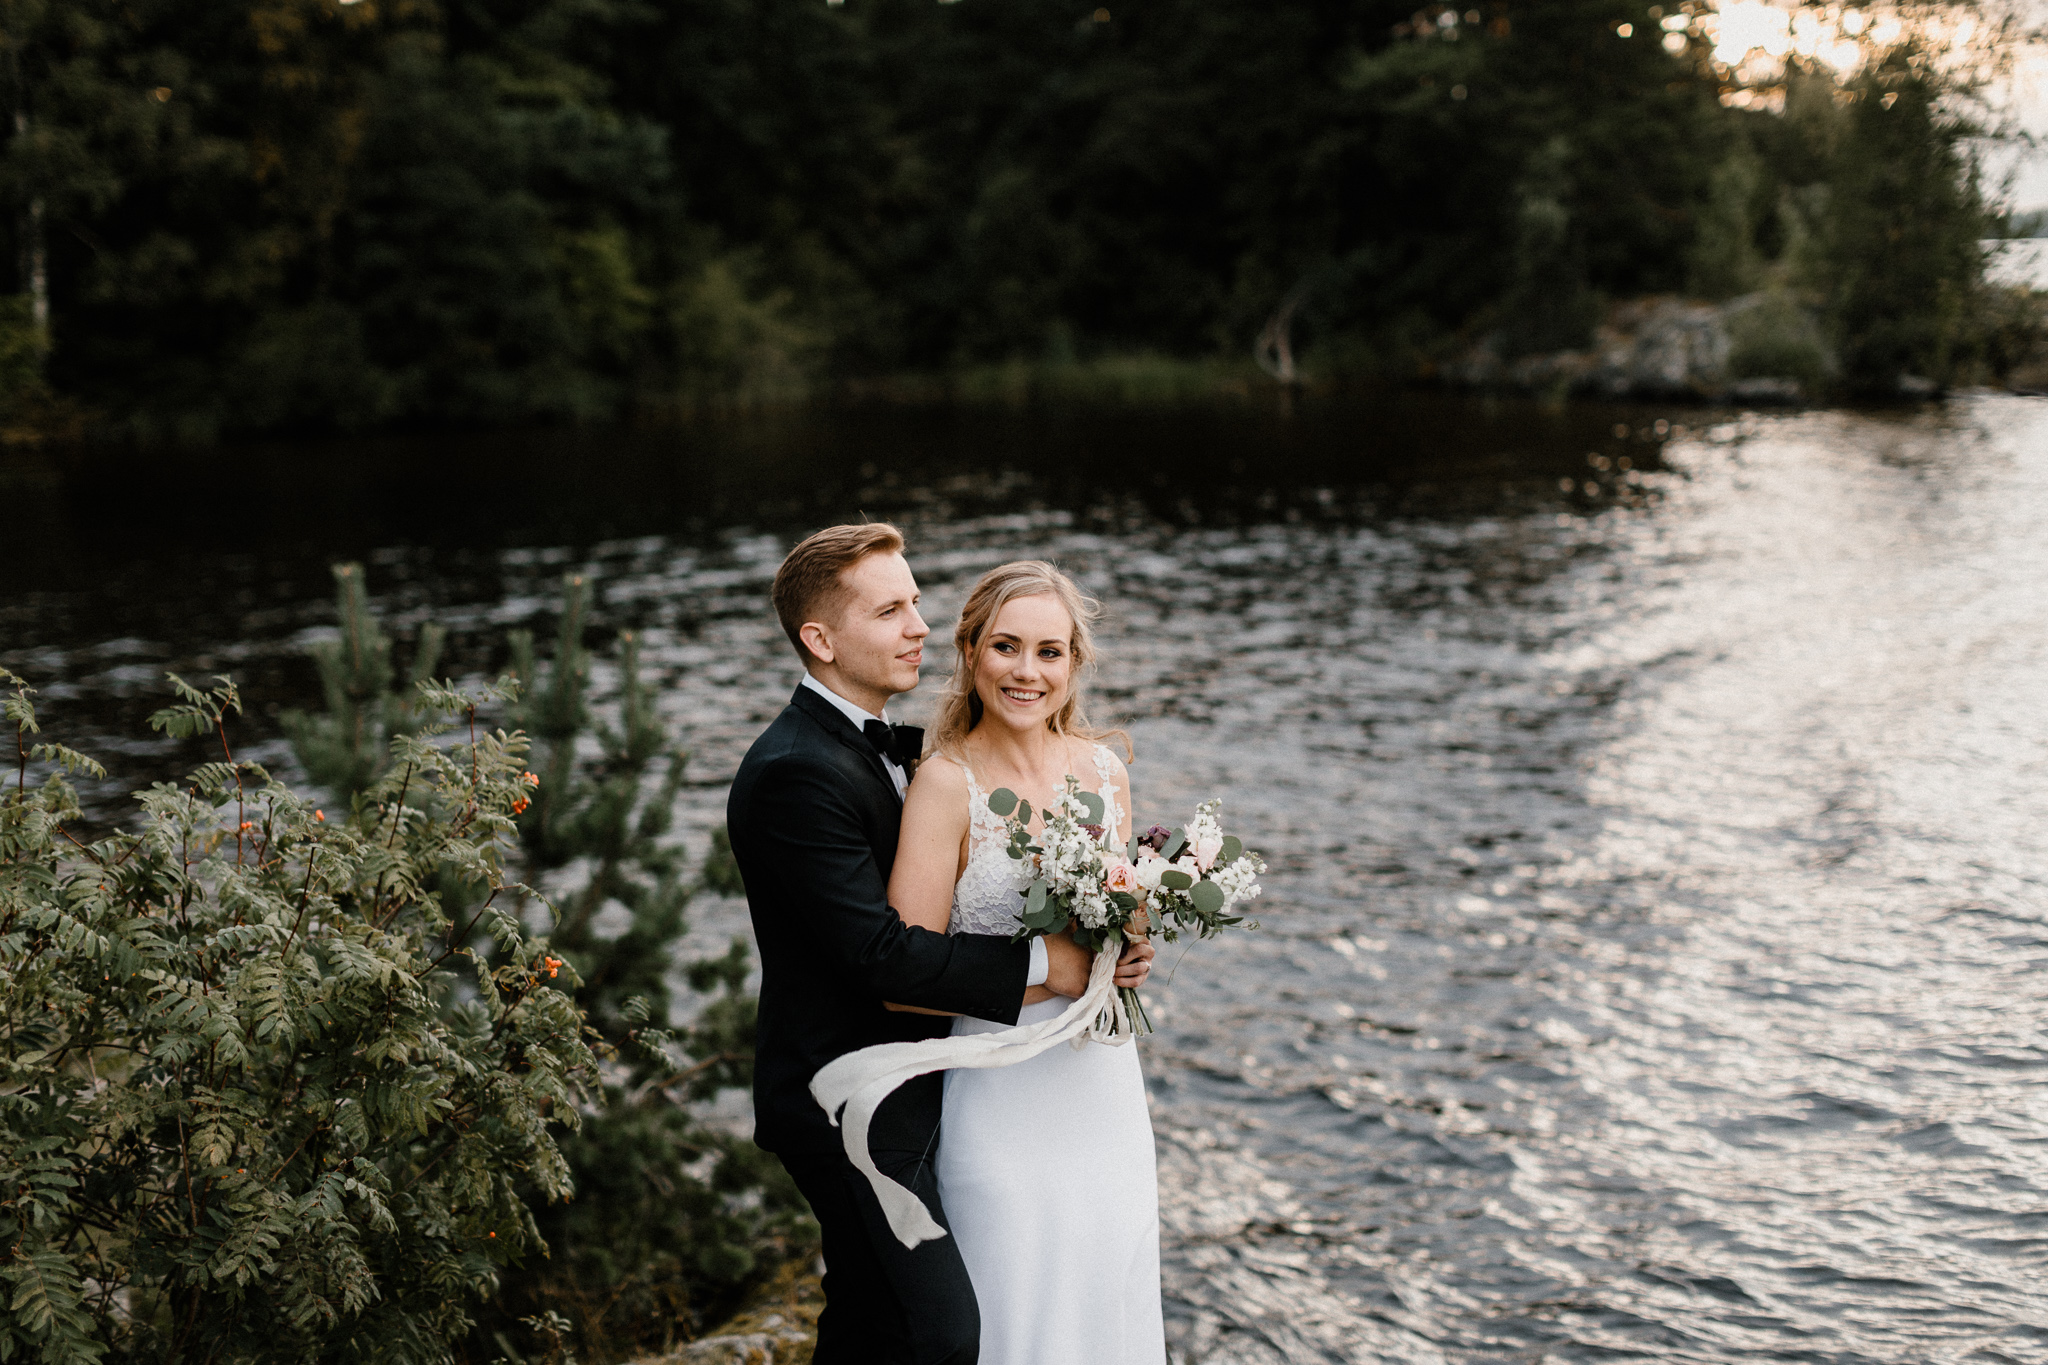 Johanna + Mikko - Tampere - Photo by Patrick Karkkolainen Wedding Photographer-133.jpg